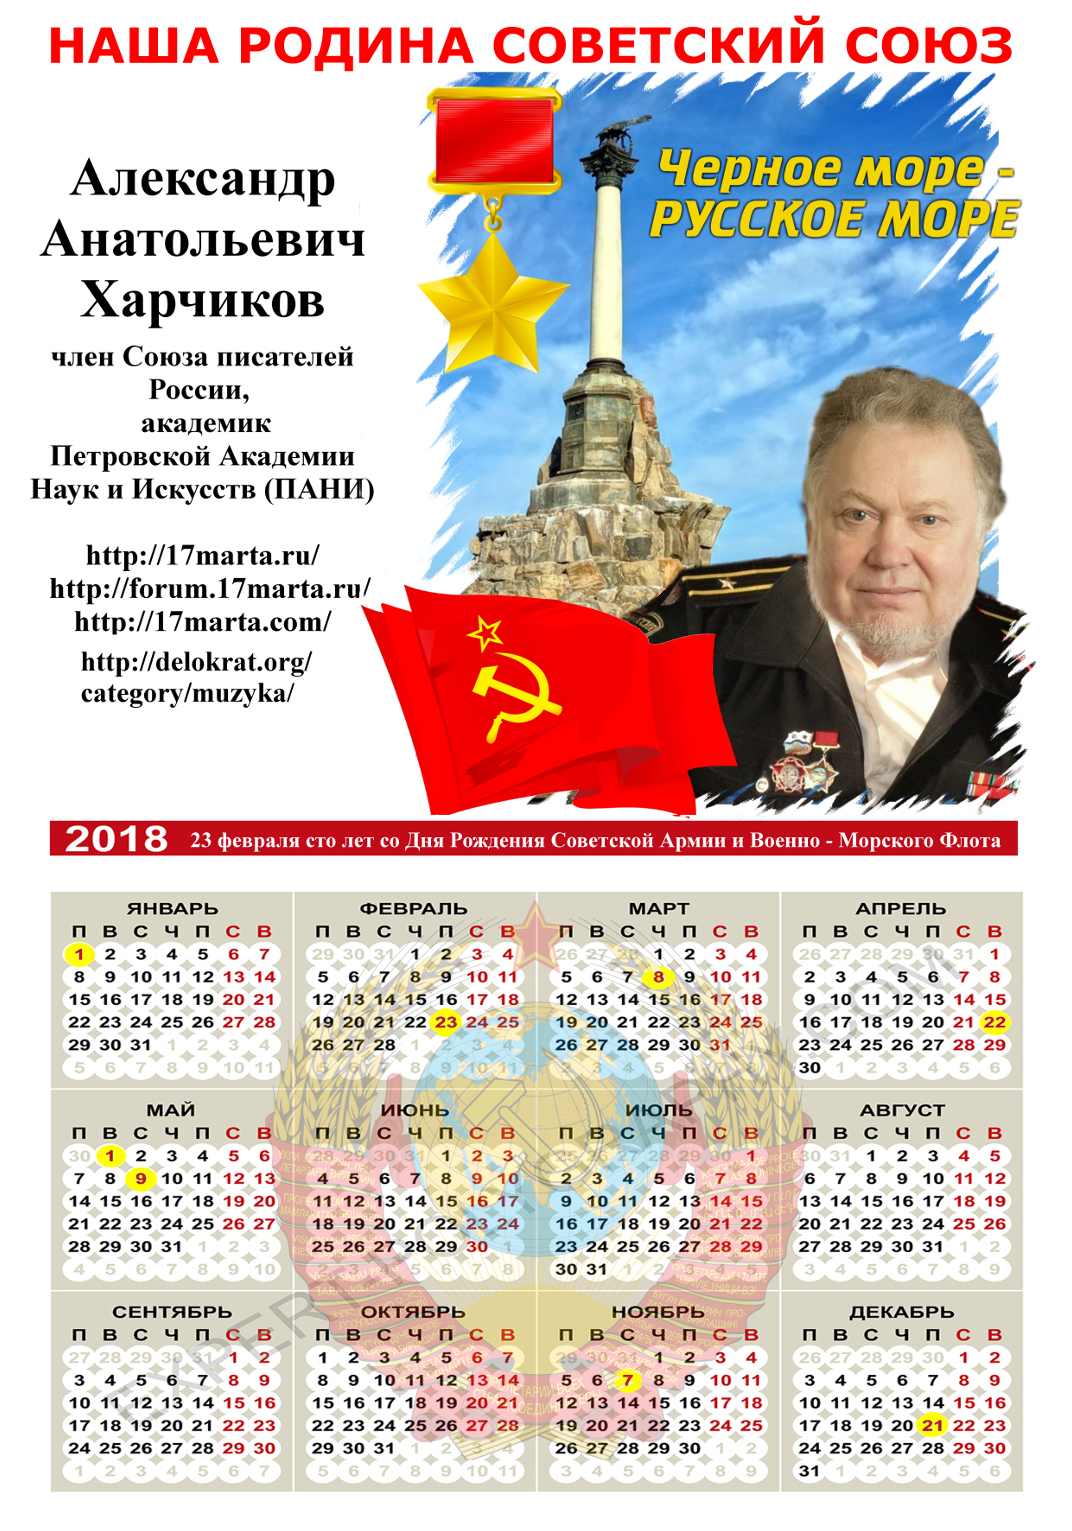 https://images.vfl.ru/ii/1514480587/19e3988e/19948662.jpg